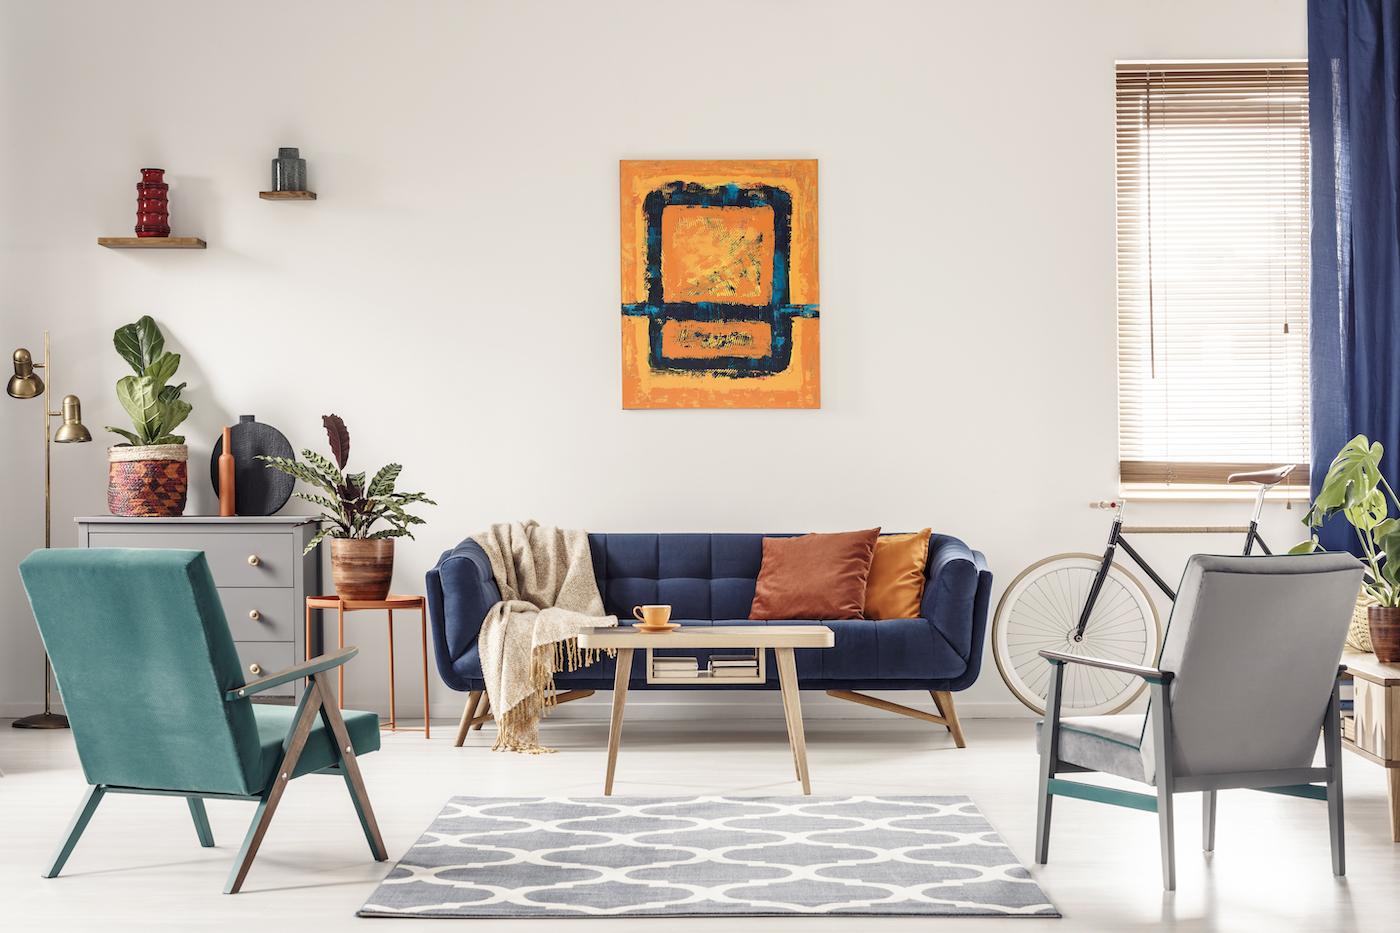 Sofá de respaldo bajo tapizado en capitoné con mesa baja en madera clara